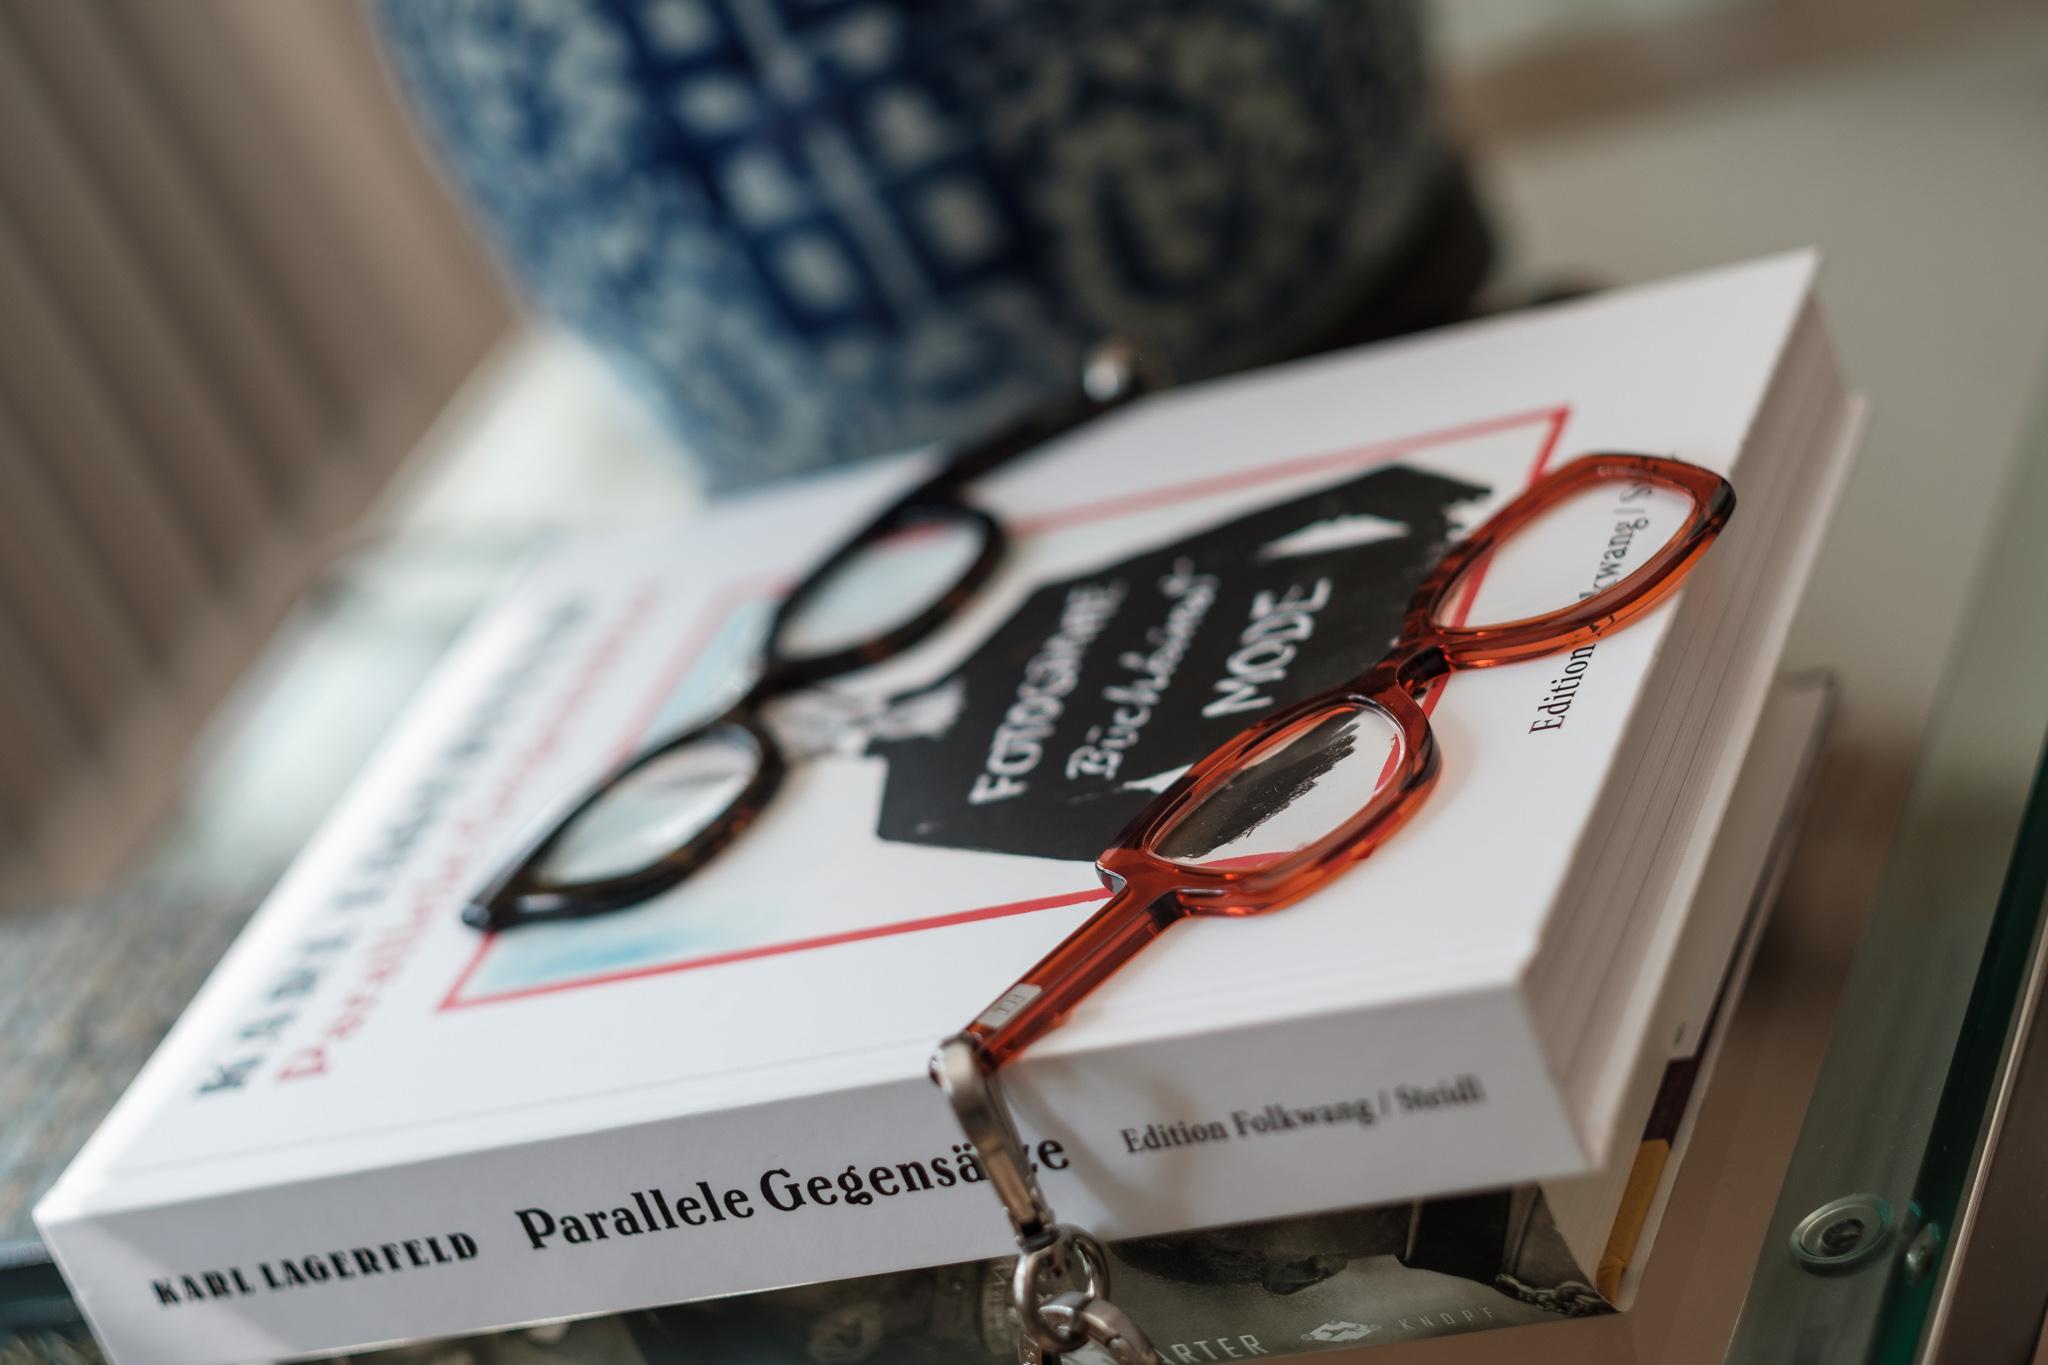 Handbrille.com, Handbrille by TOM+HATTY, coole Lesebrille mit Kette als modisches Accessoire, Fashion-Blog, Lieblingsstil.com,